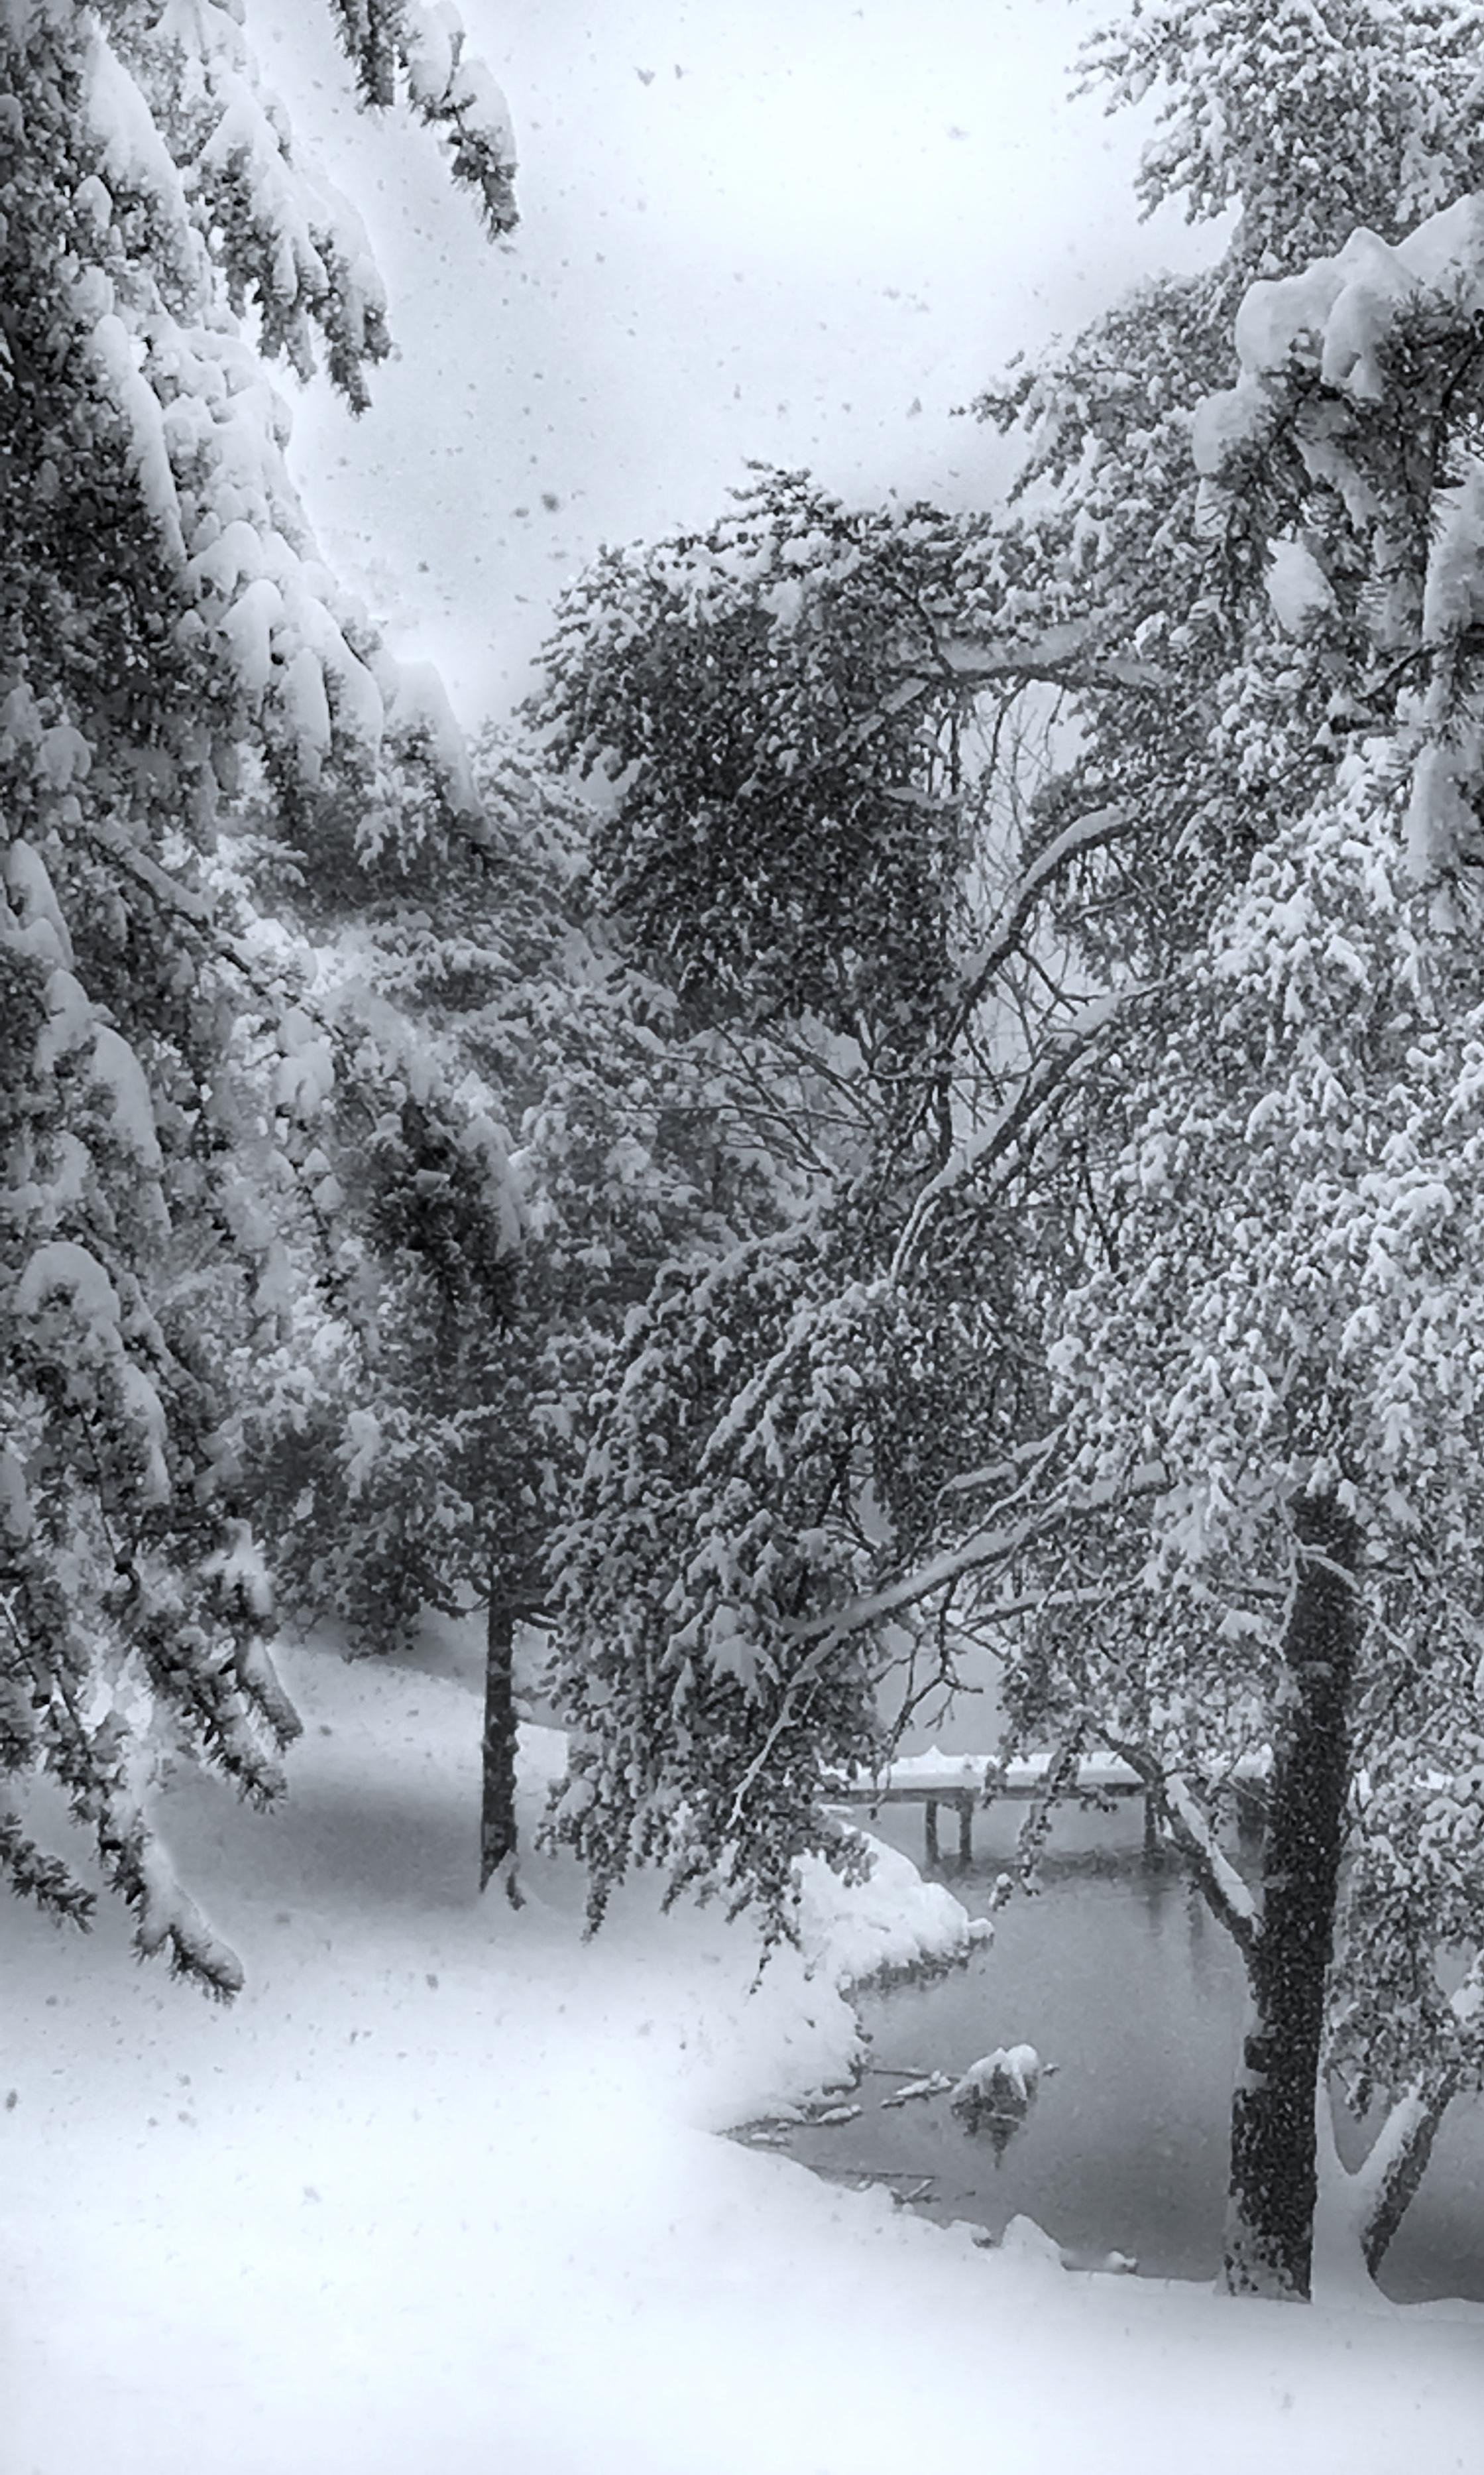 Snowy path on lake